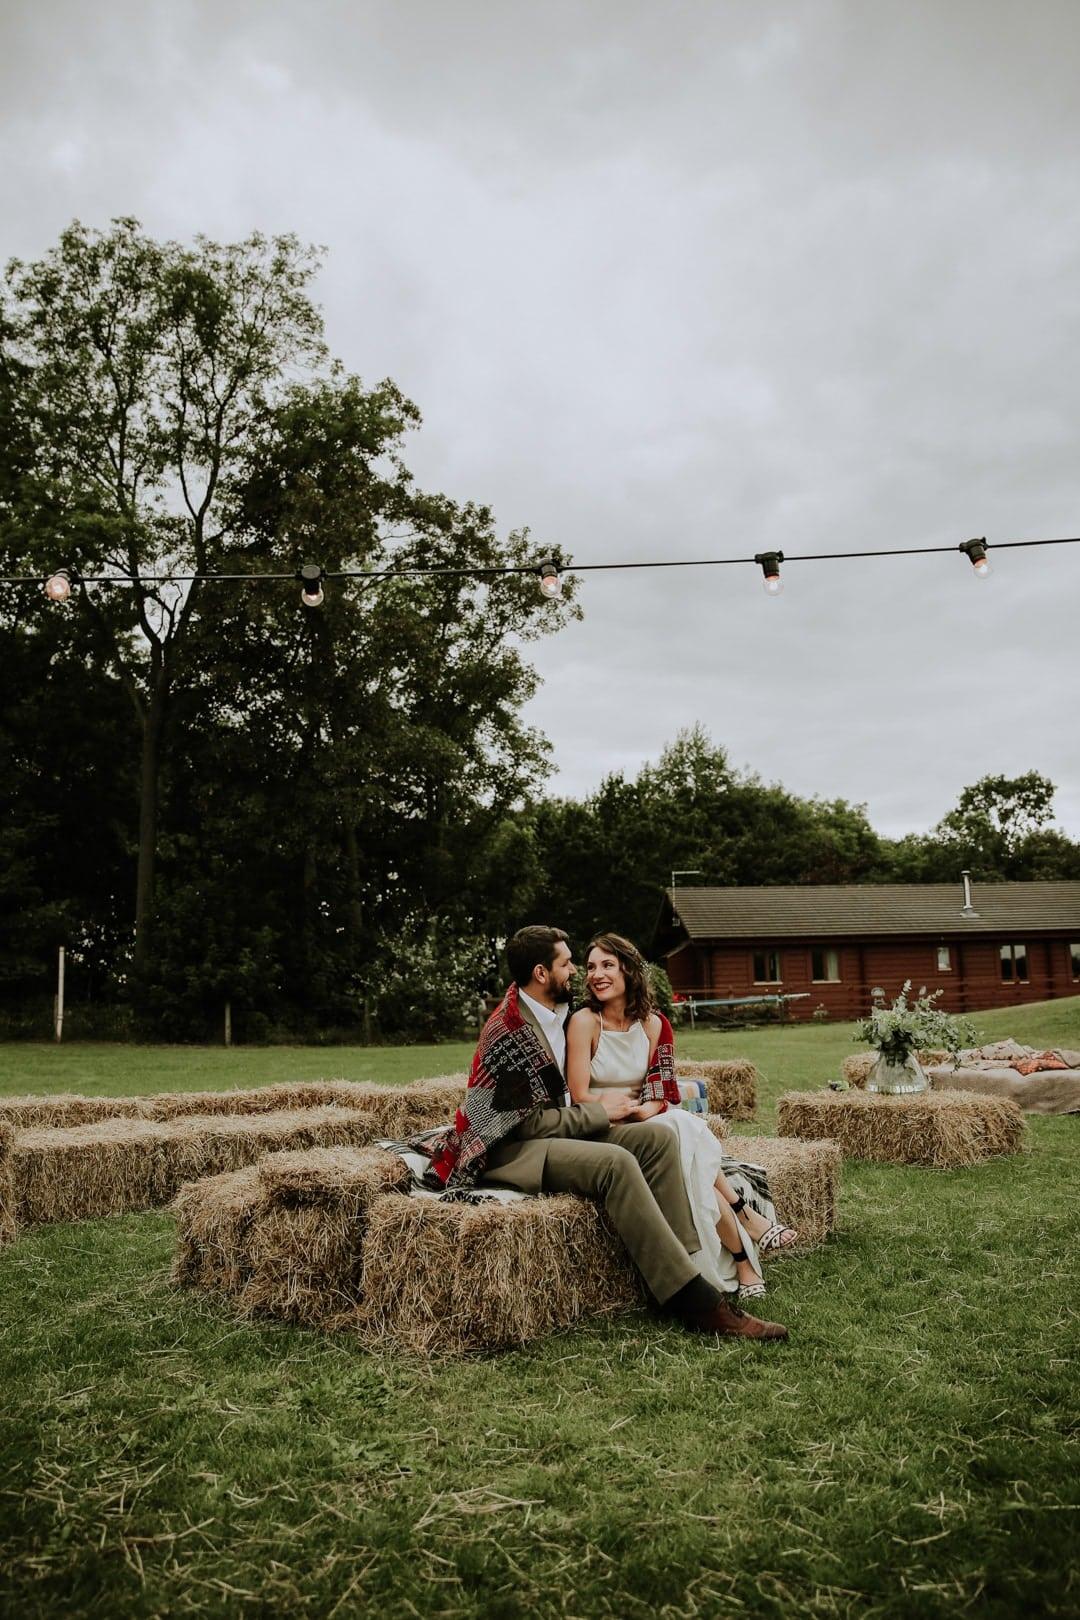 cool-bride-groom-snuggle-blanket-diy-leicestershire-wedding-festoon-lights